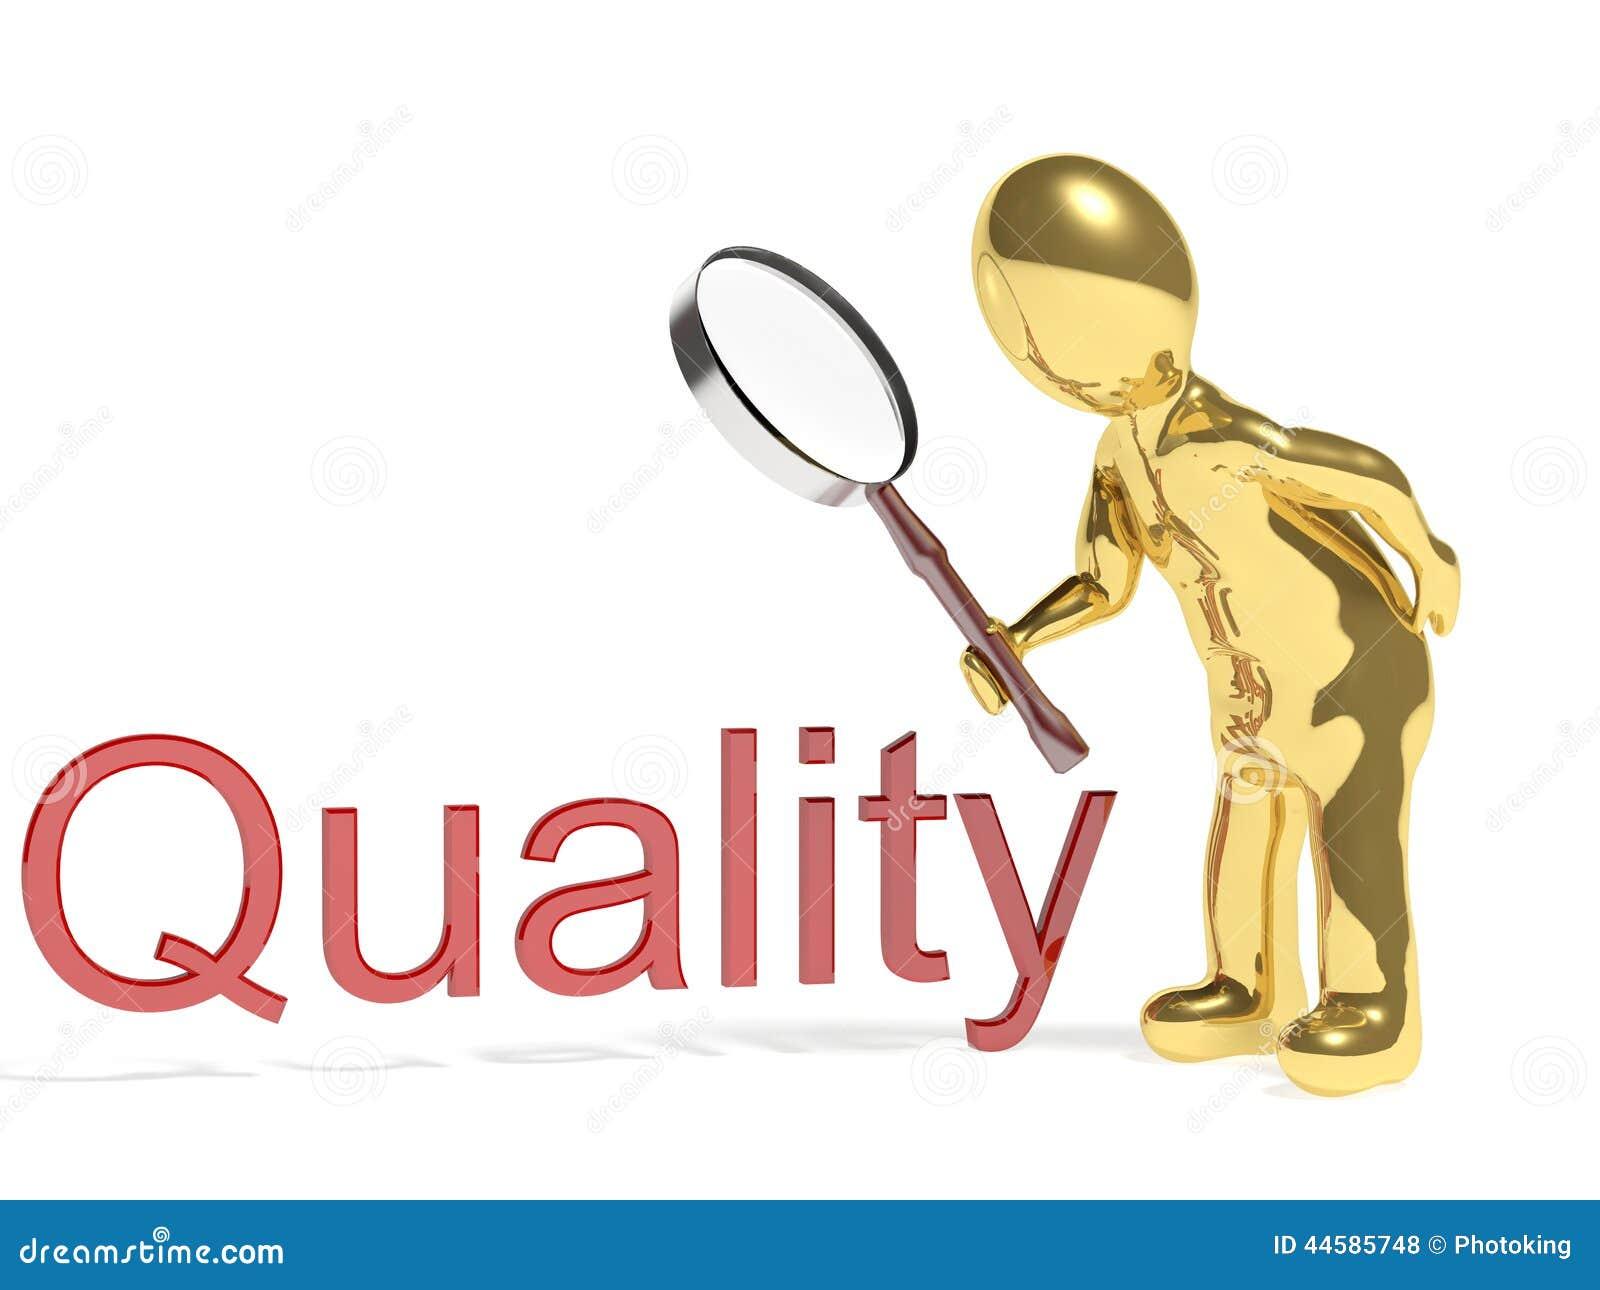 quality man